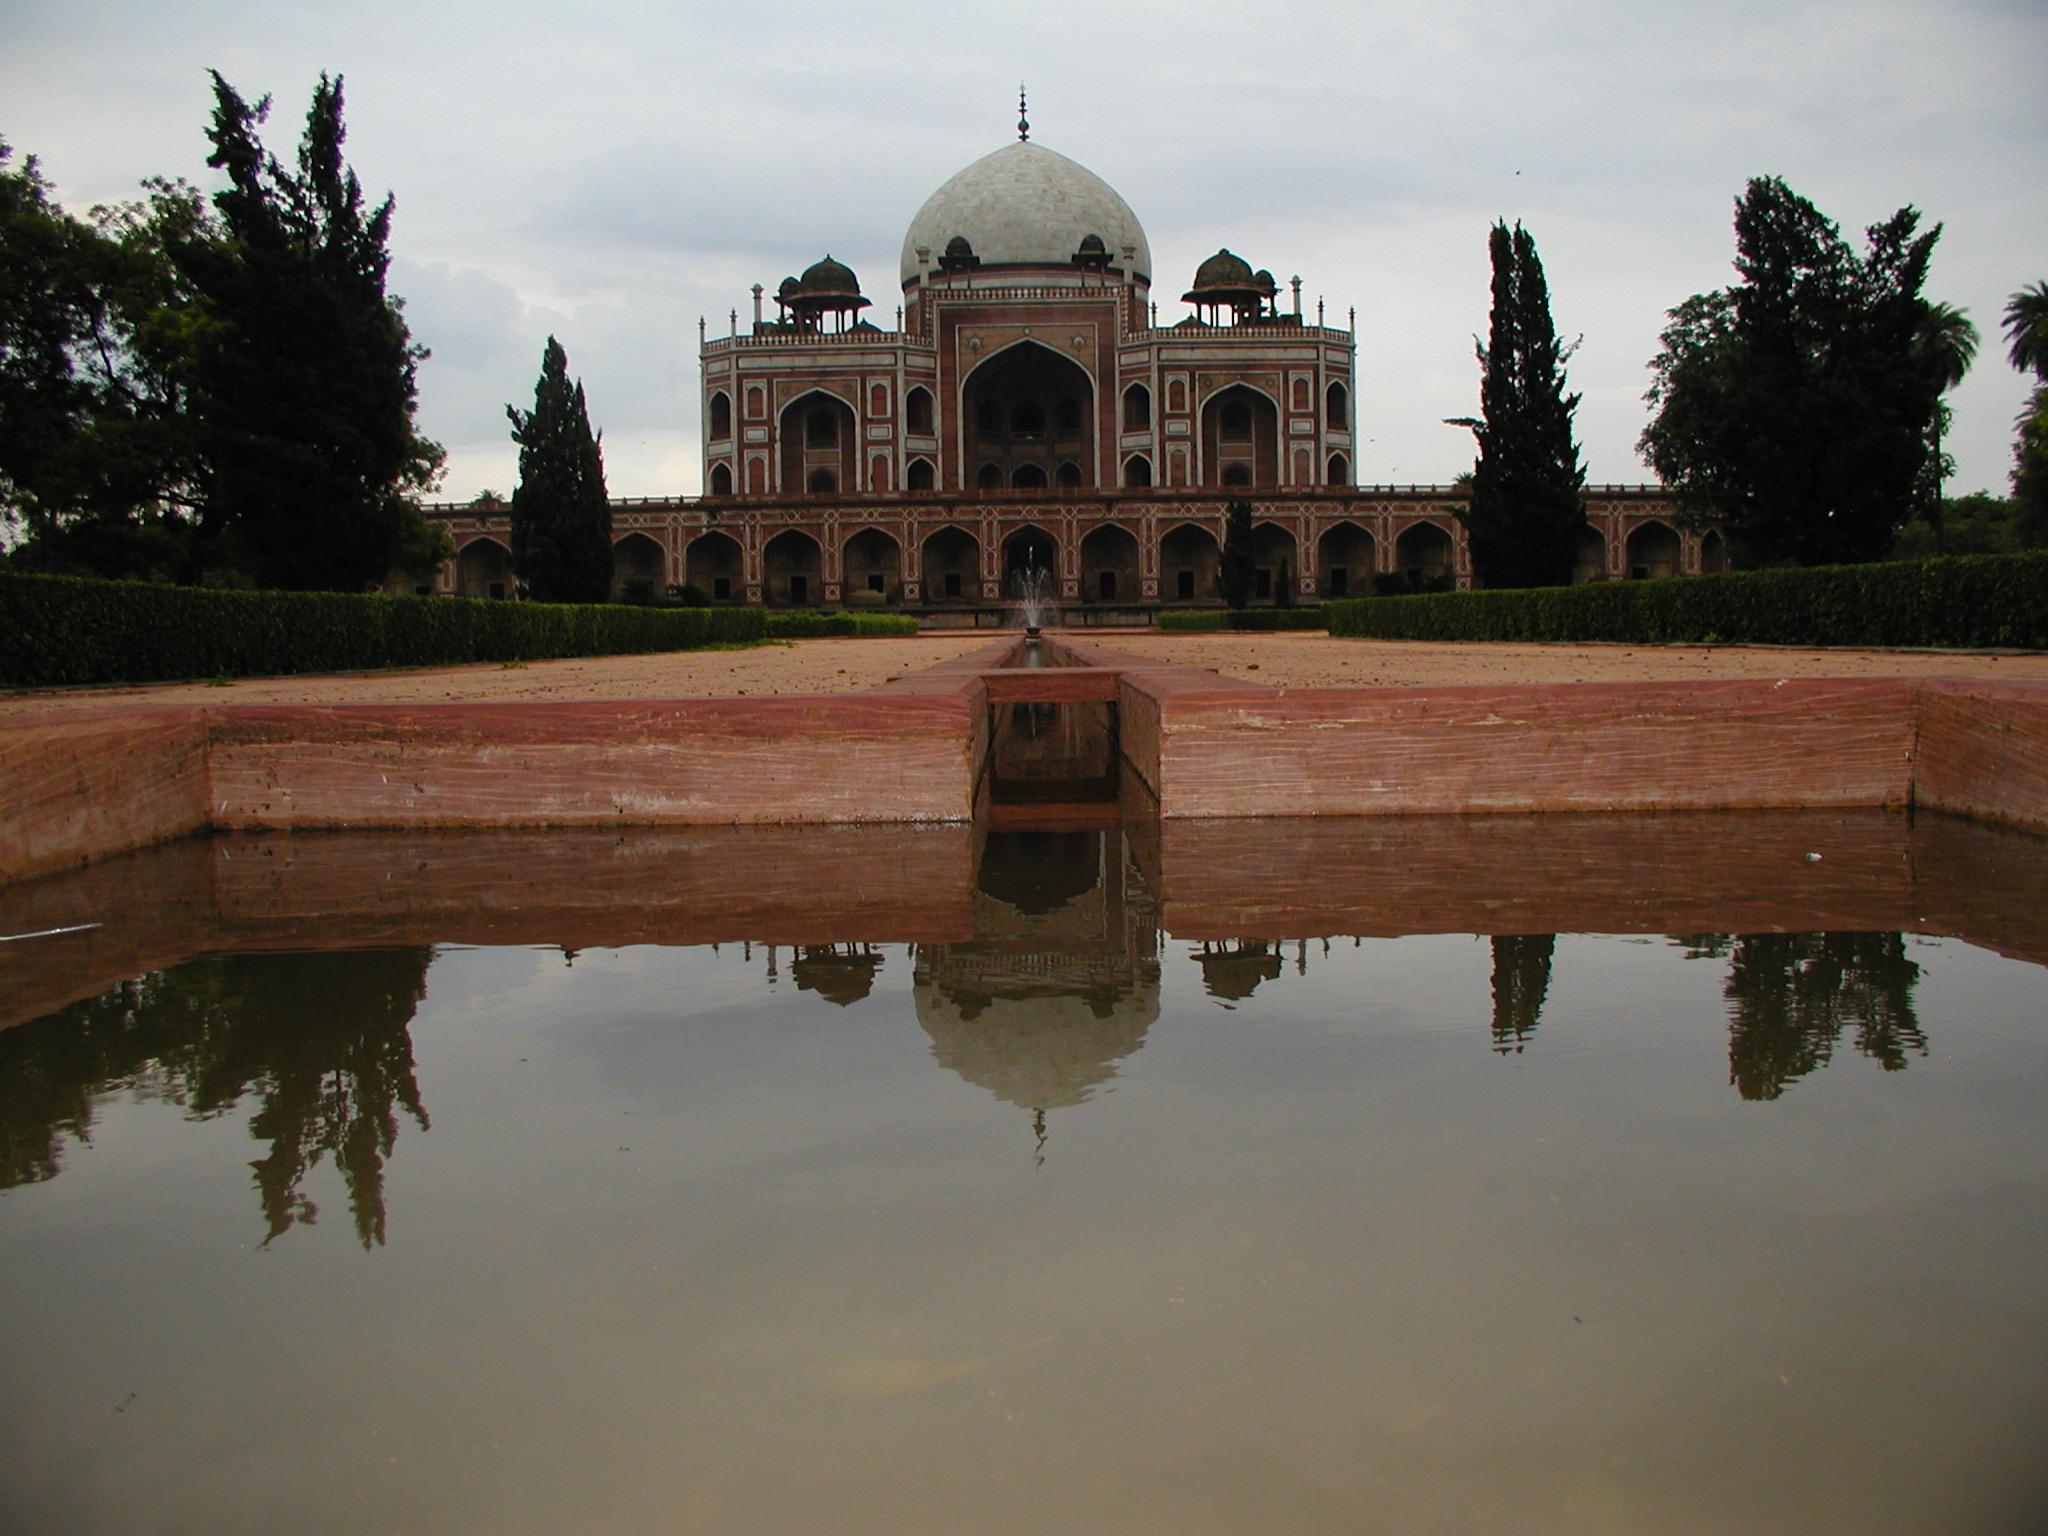 The Humayun Tomb